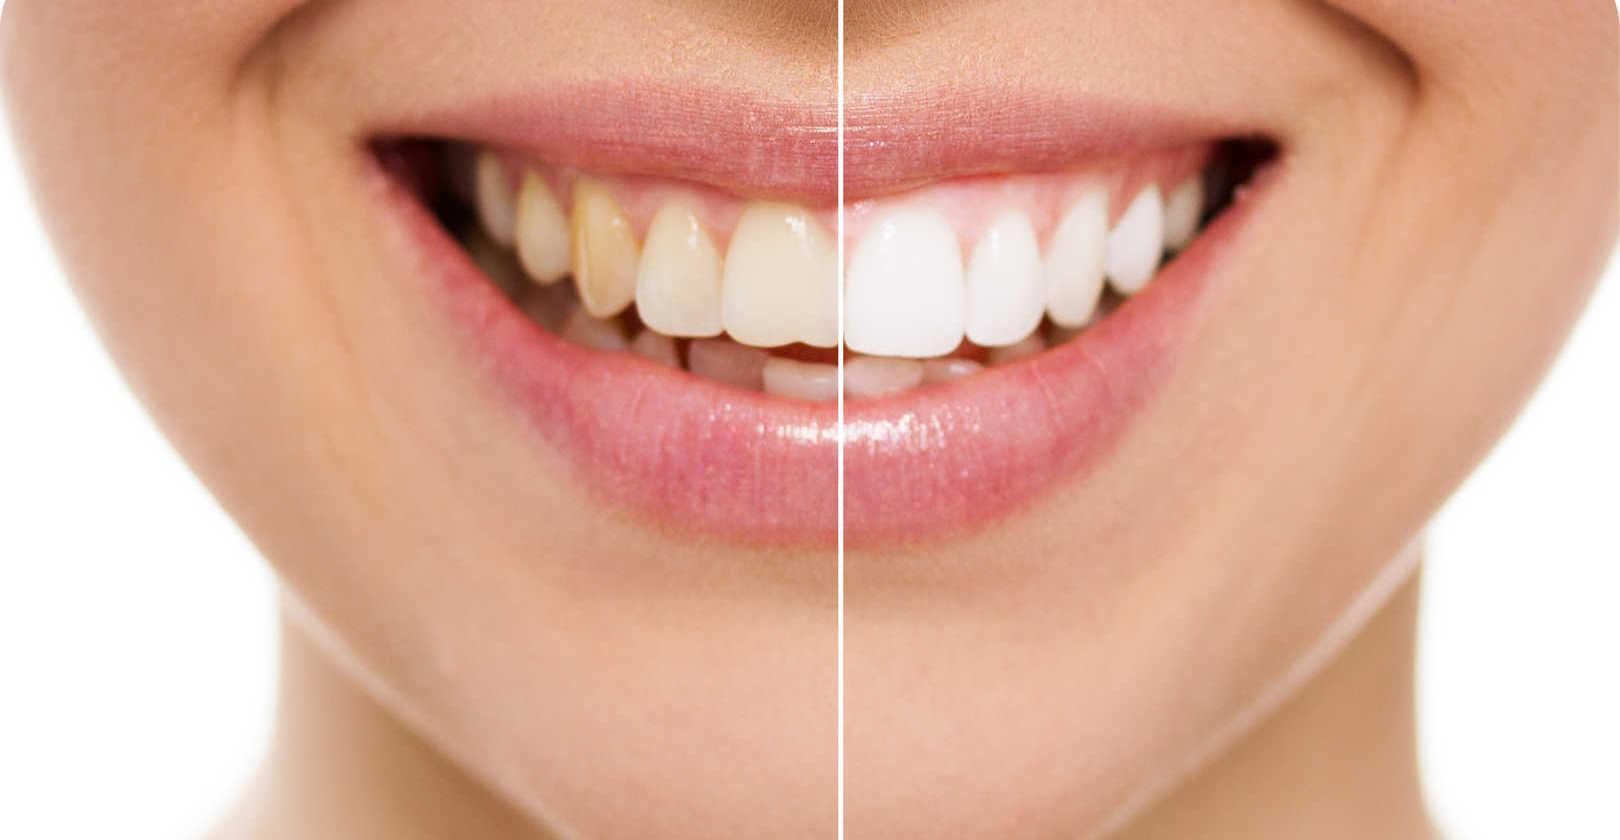 Teeth whitening at St Clair Family Dental